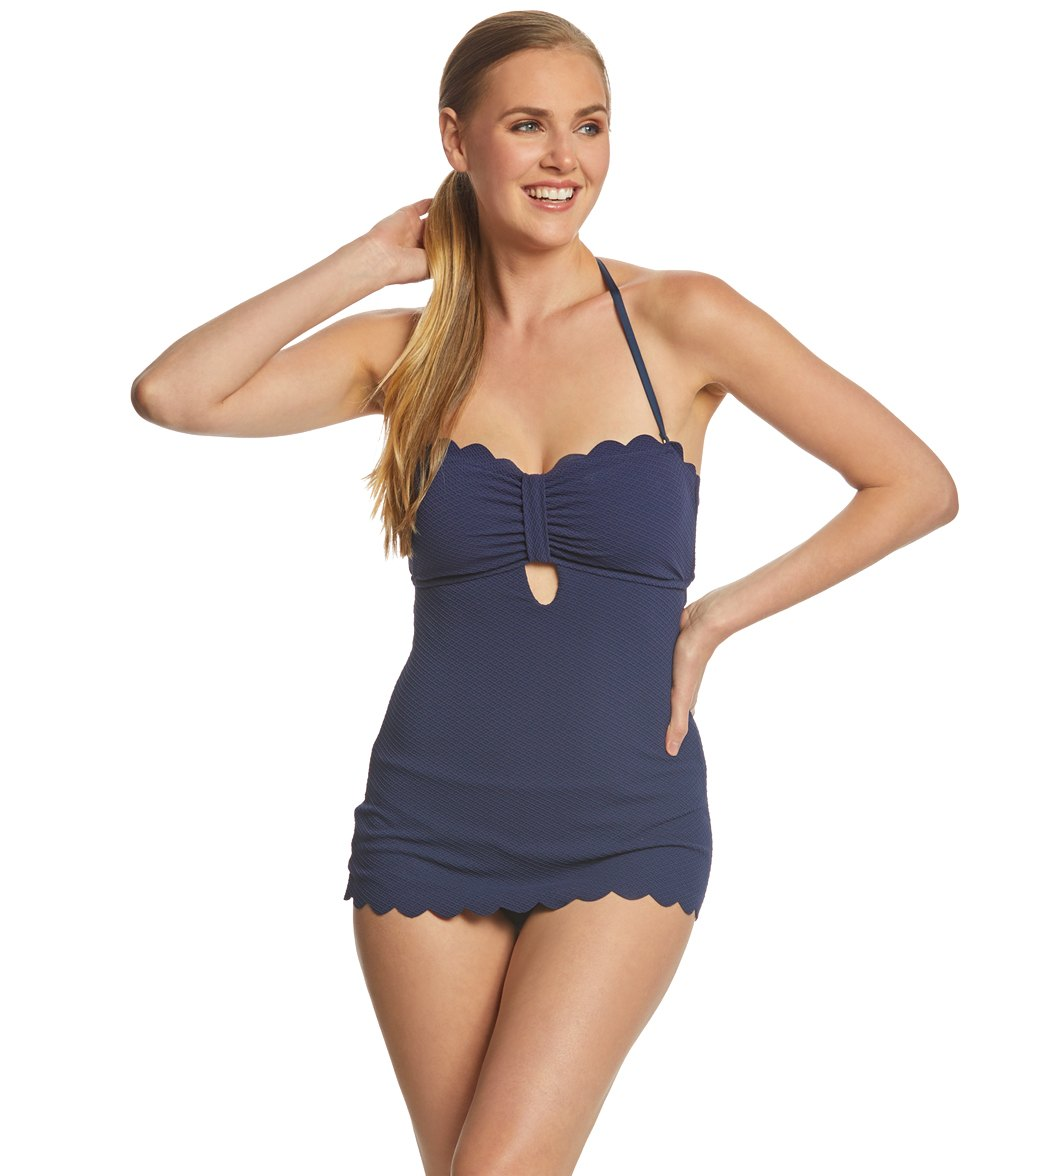 fb82298b9a105f Jessica Simpson Swimwear Under The Sea Retro One Piece Swimsuit at ...